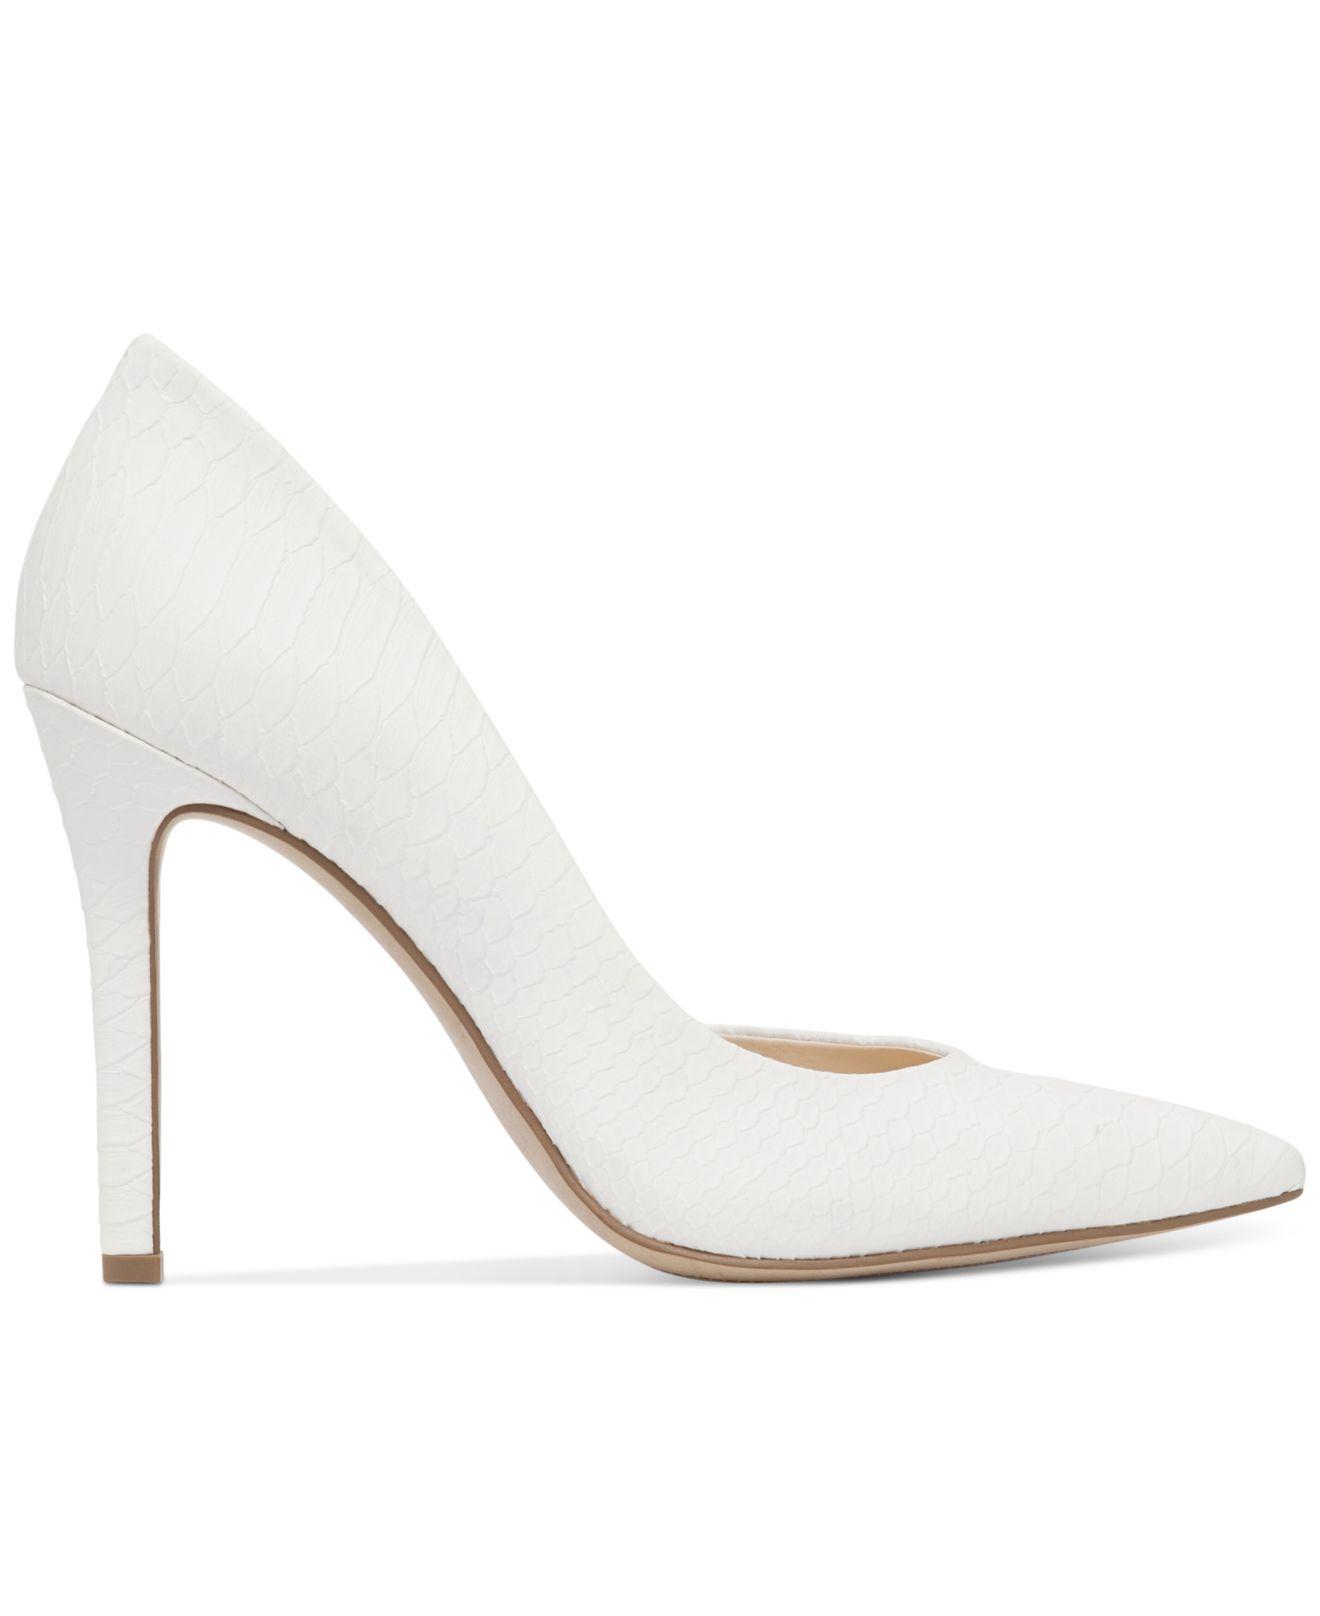 Lyst Jessica Simpson Claudette D Orsay Pumps In White